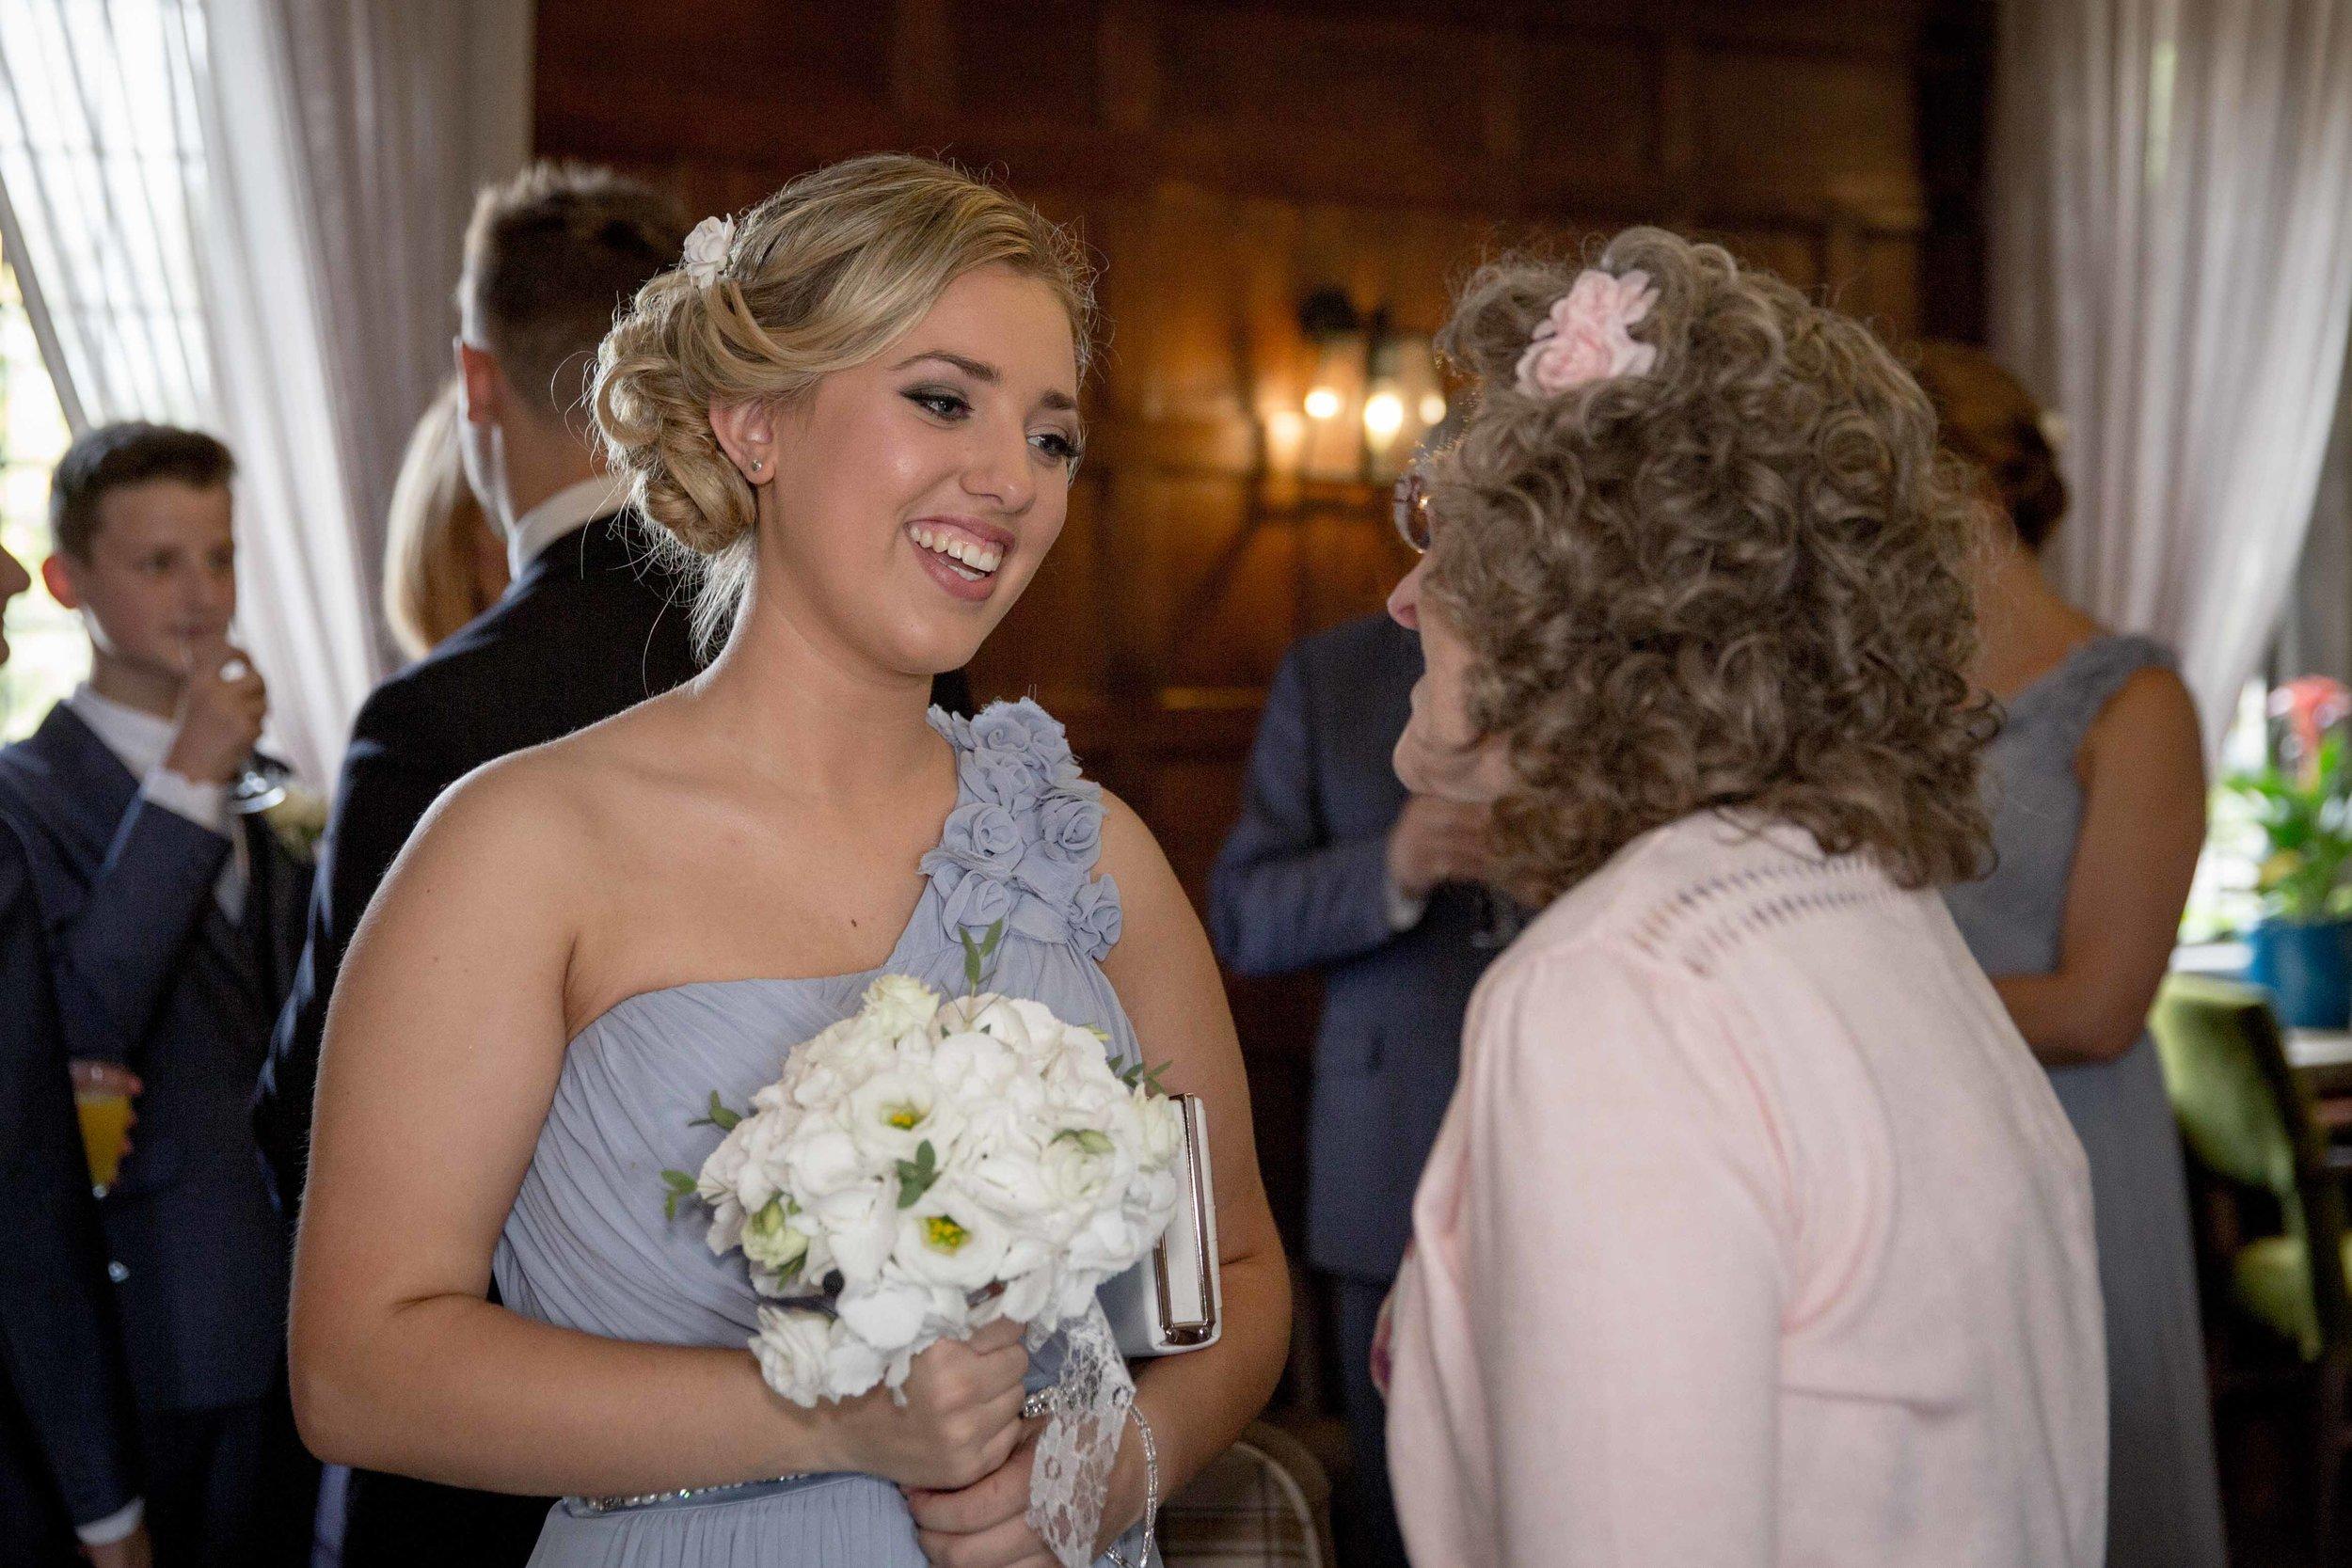 cotswold-wedding-photography-at-stonehouse-court-hotel-natalia-smith-photography-gloucestershire-wedding-photographer-25.jpg